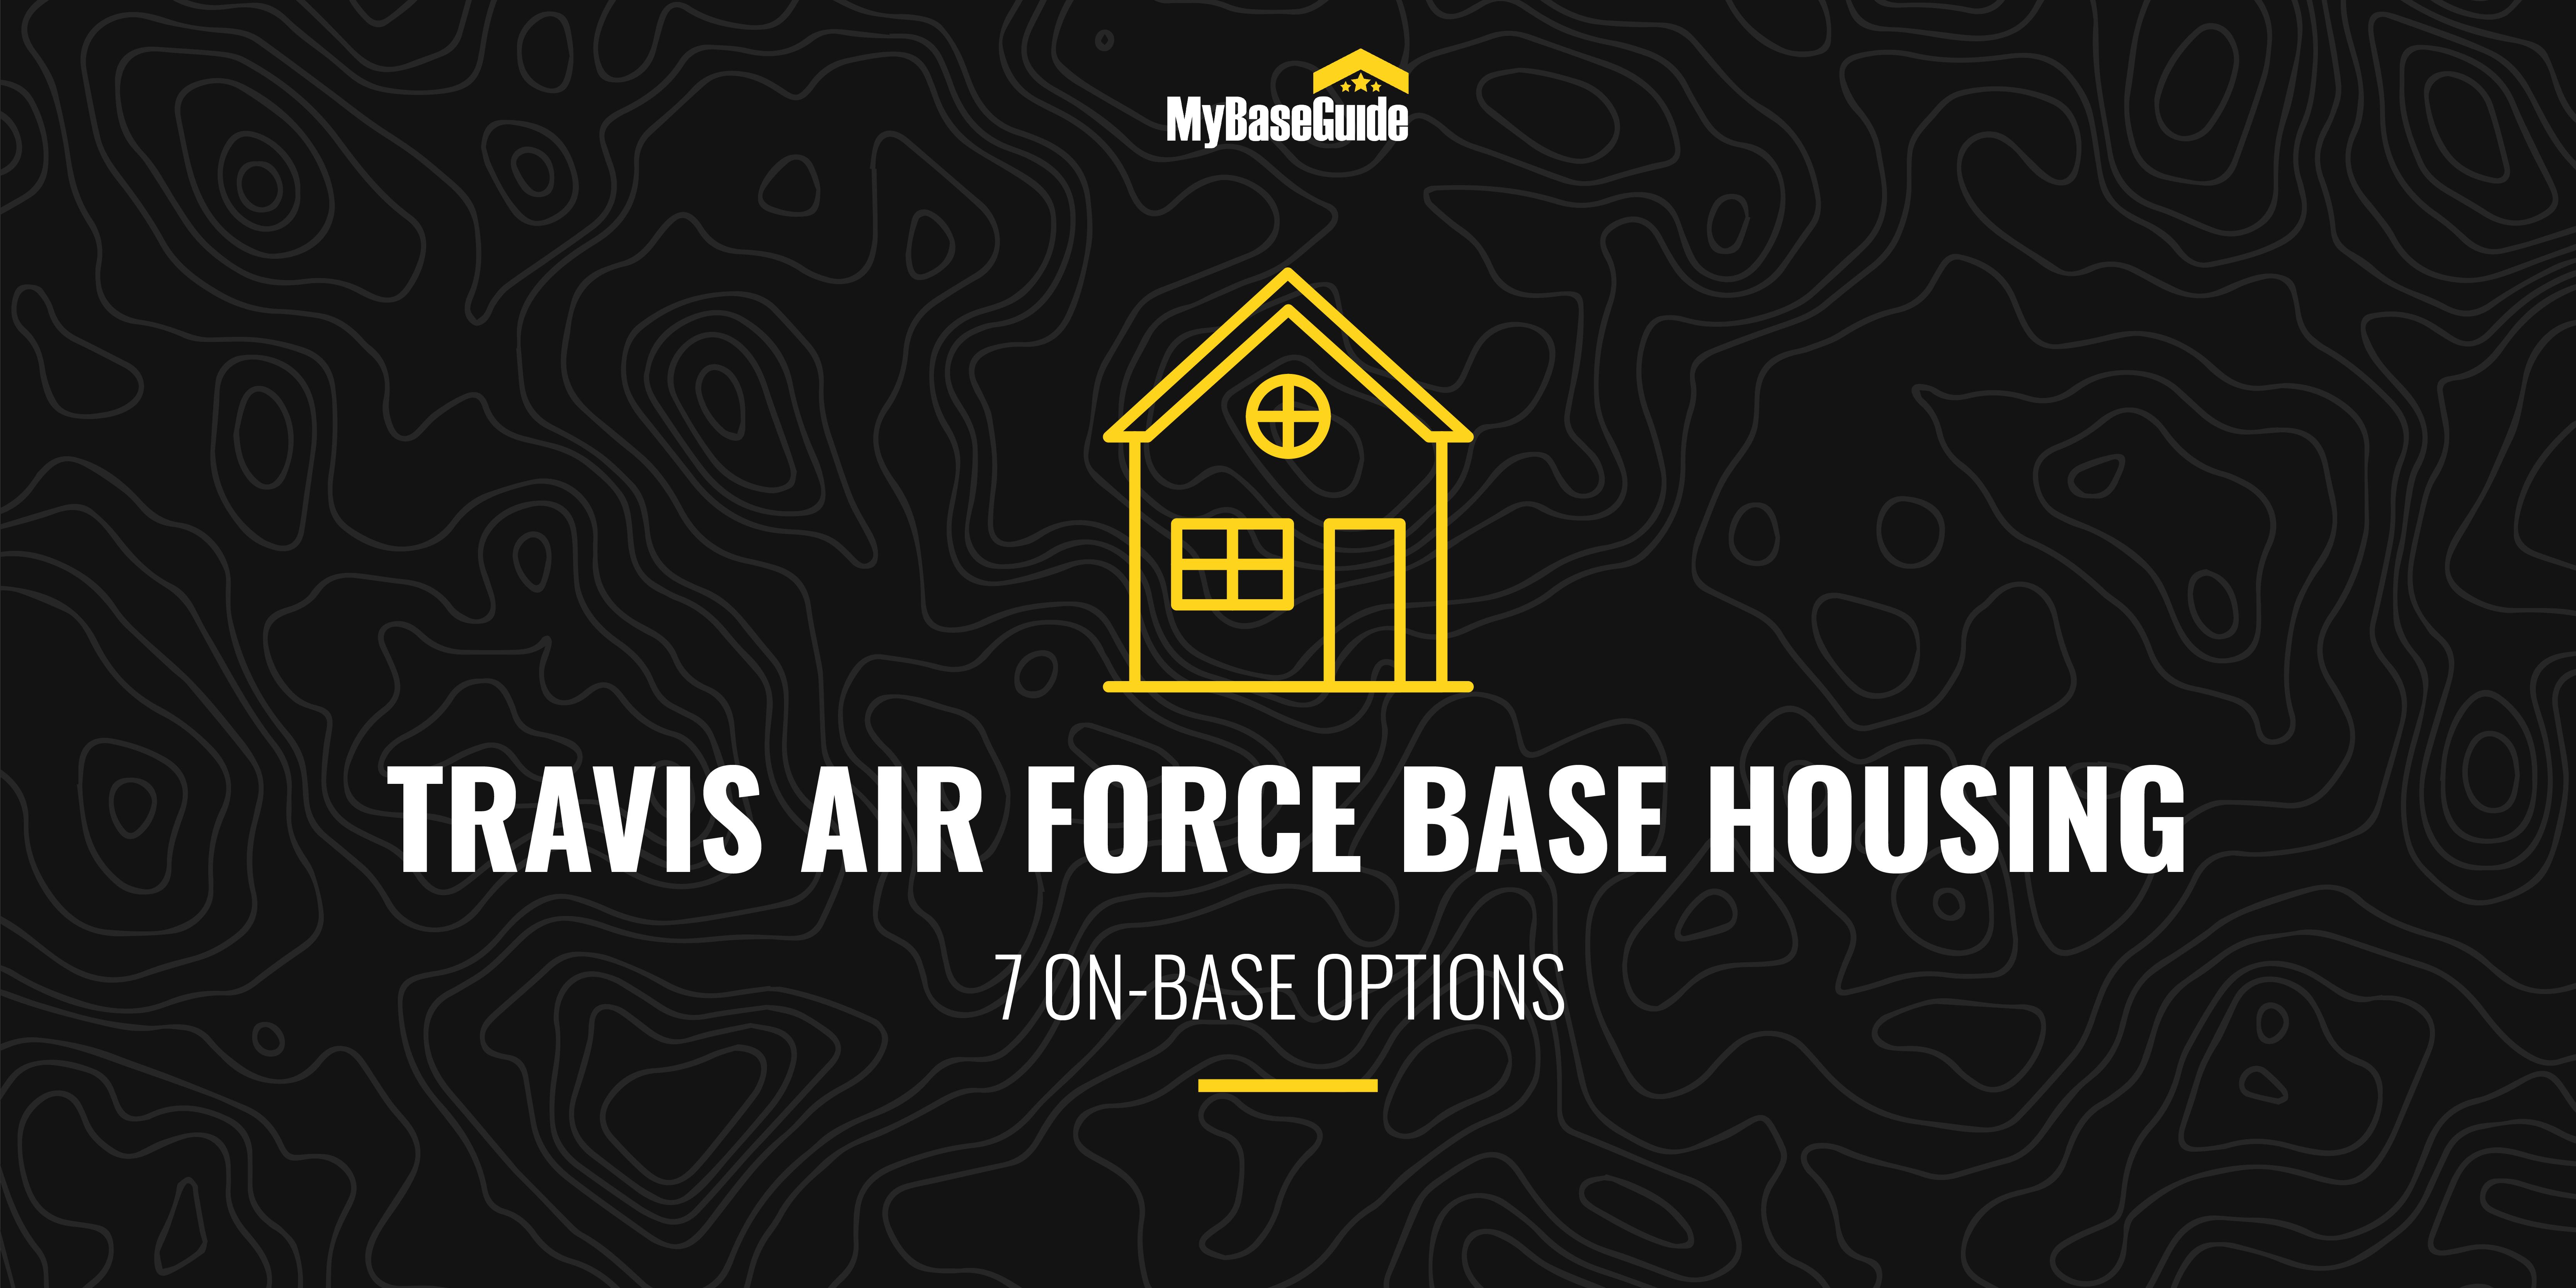 Travis AFB Housing: 7 On-Base Options